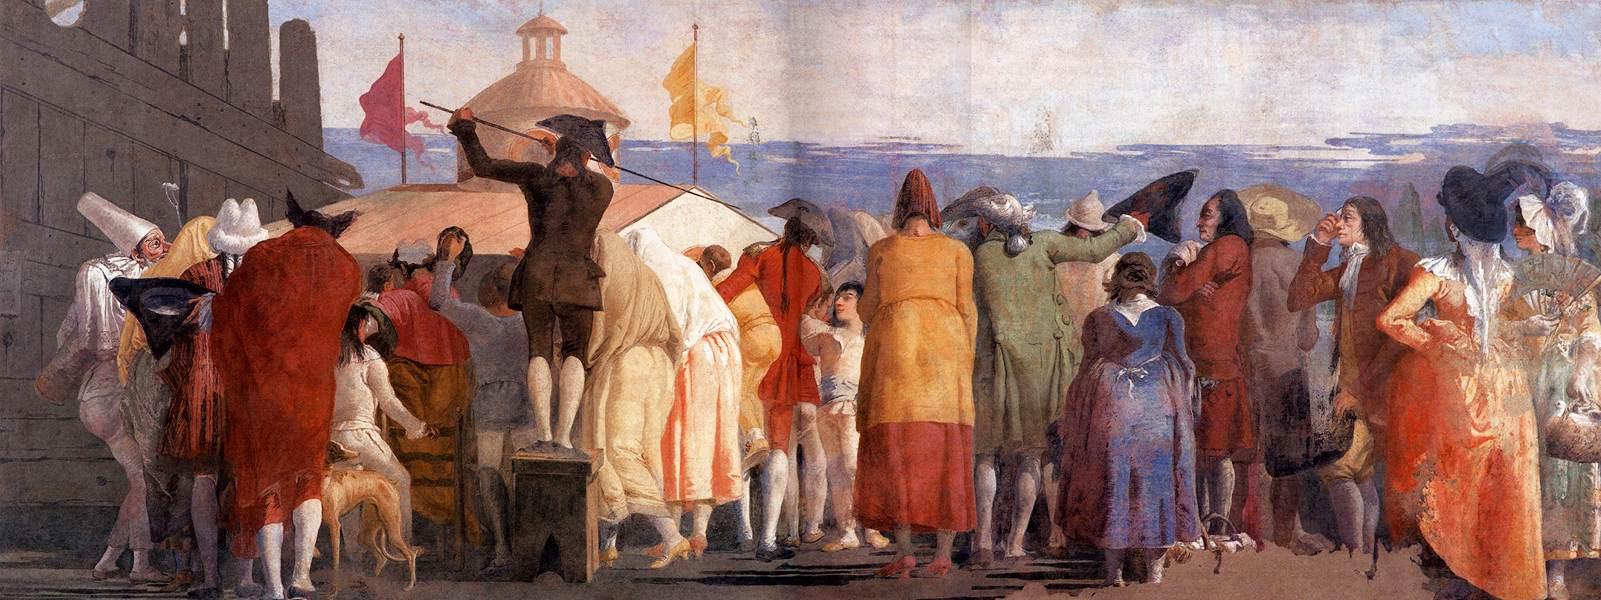 Mundo Novo fresco by Domenico Tiepolo